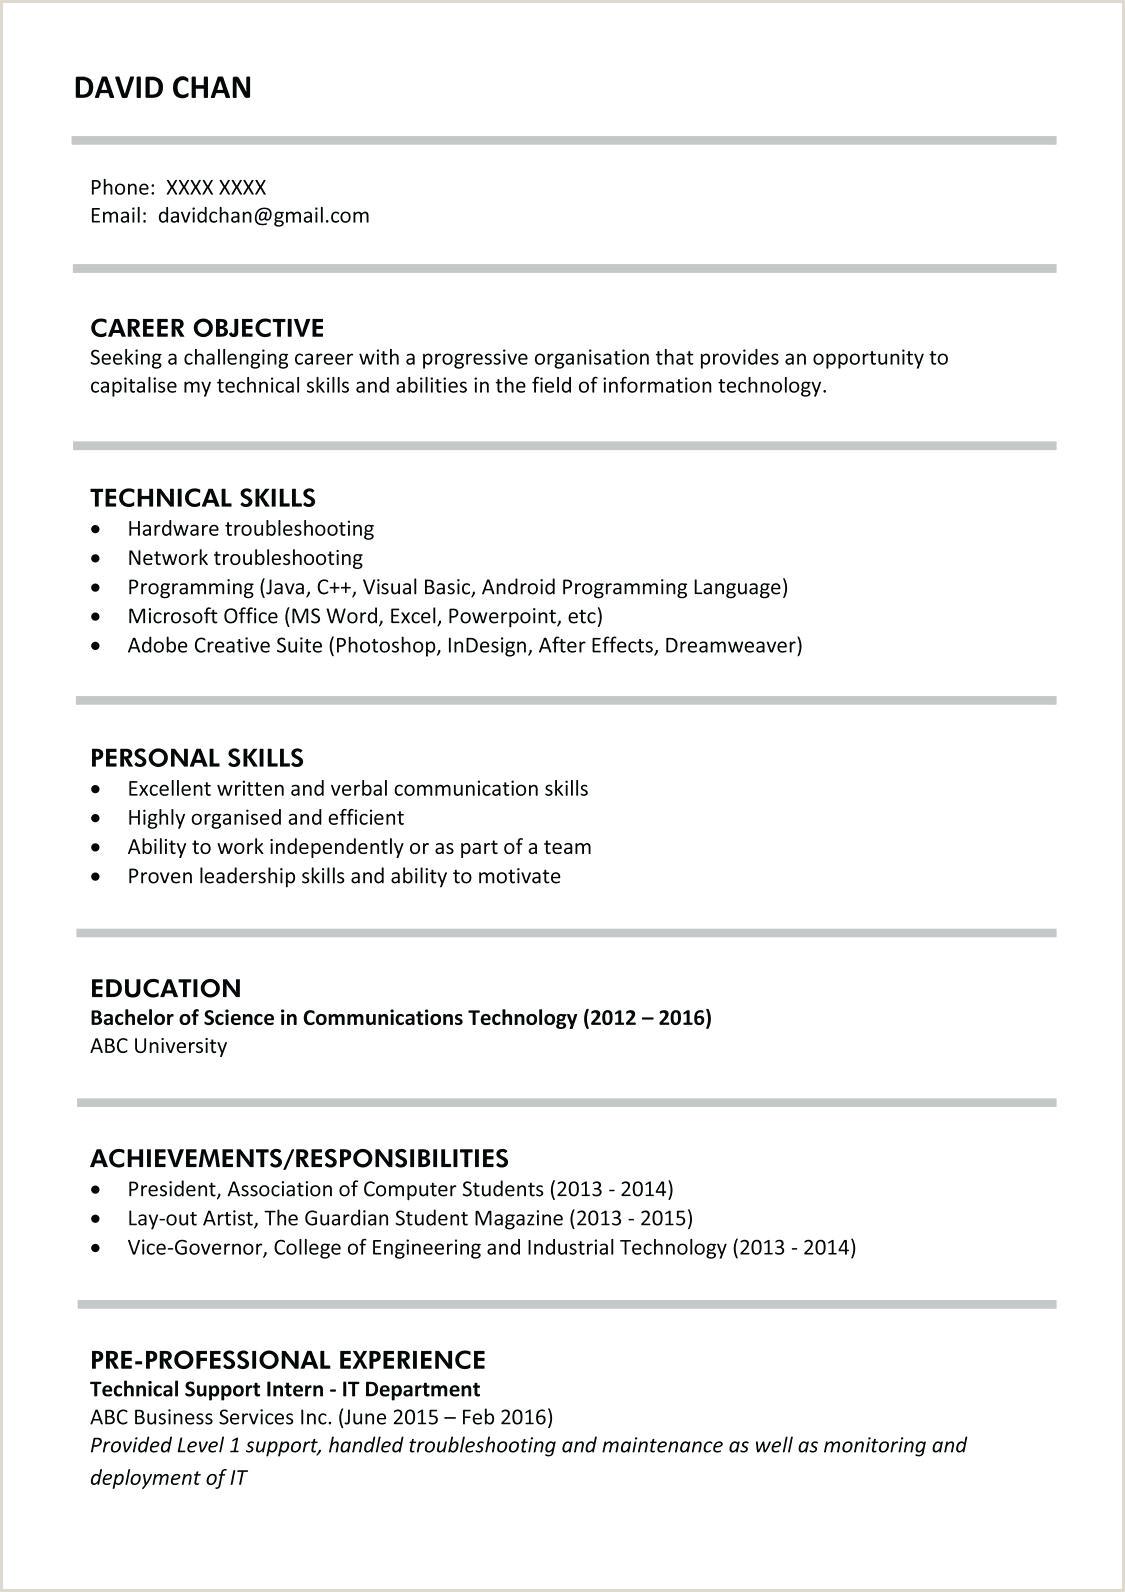 Sample Resume Templates Good Format Latest Cv Pdf Doc Best